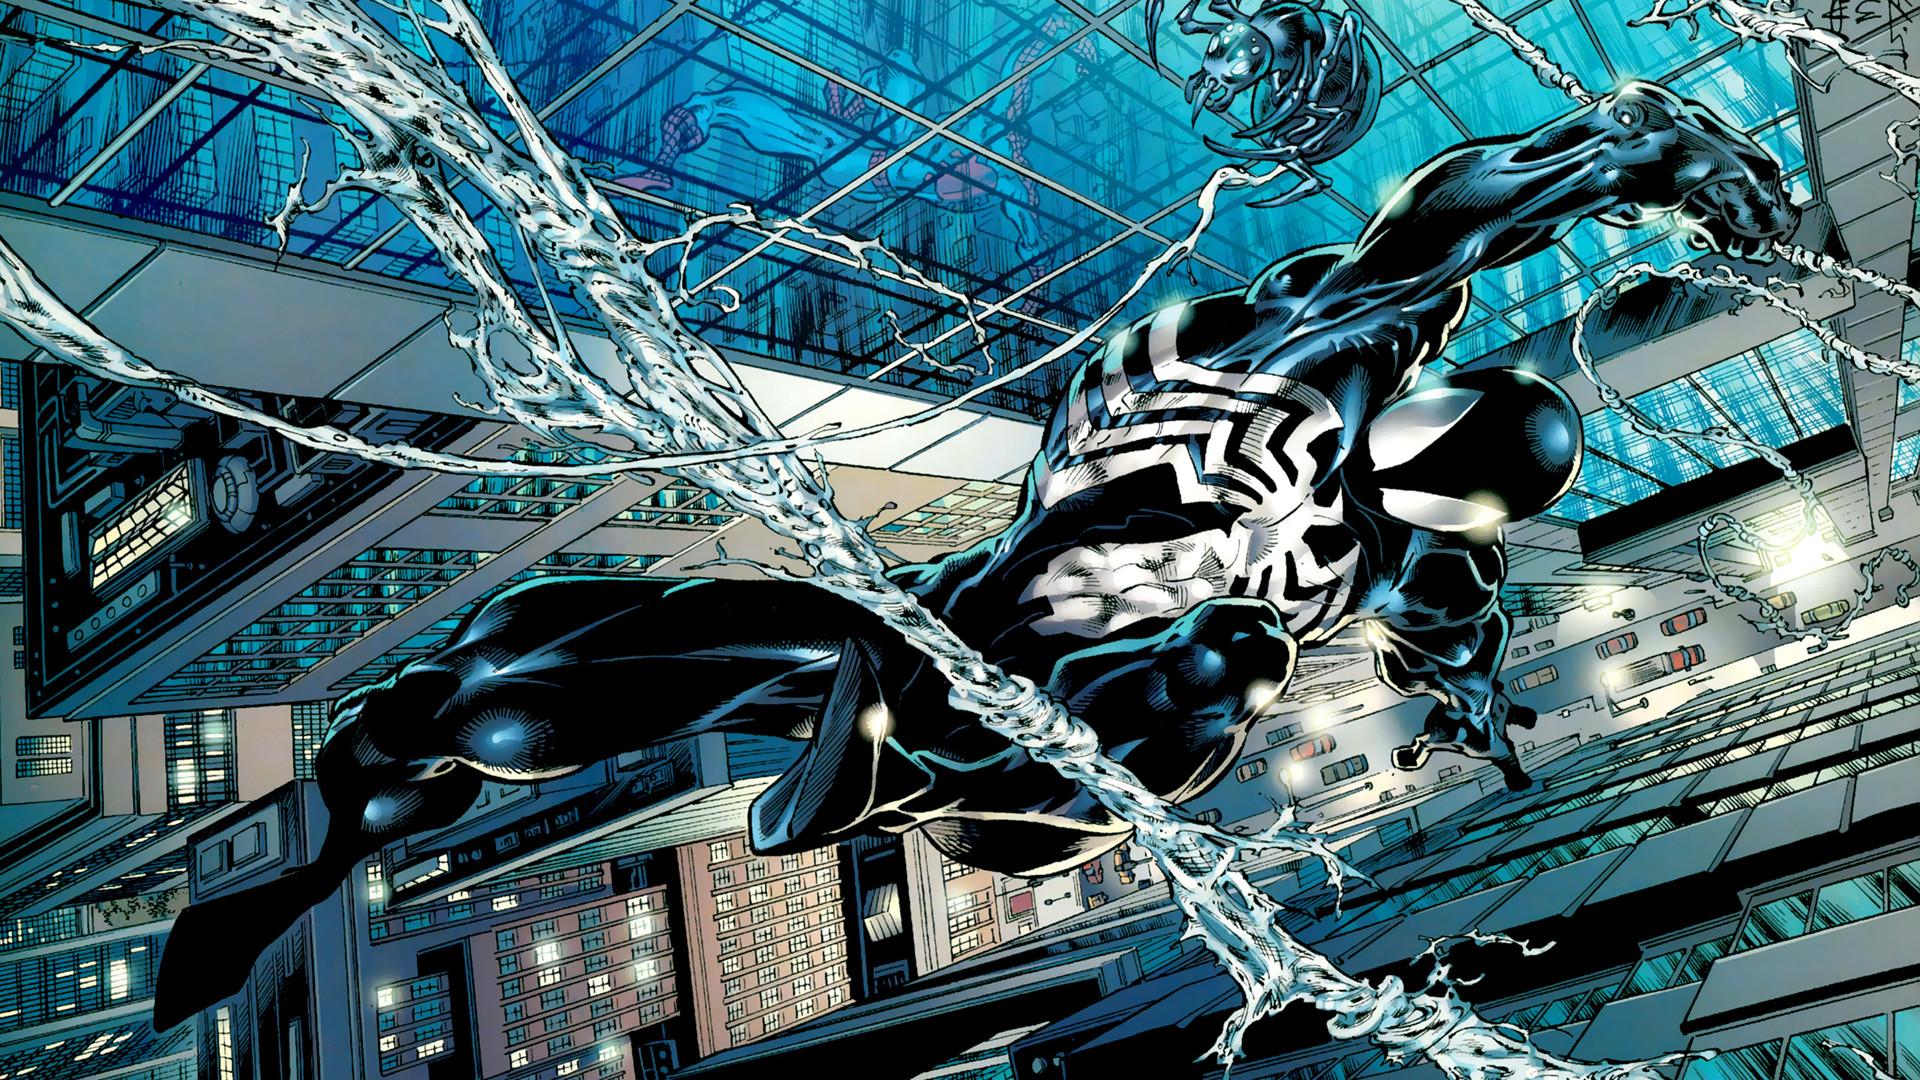 Spider-man Venom HD wallpaper thumb